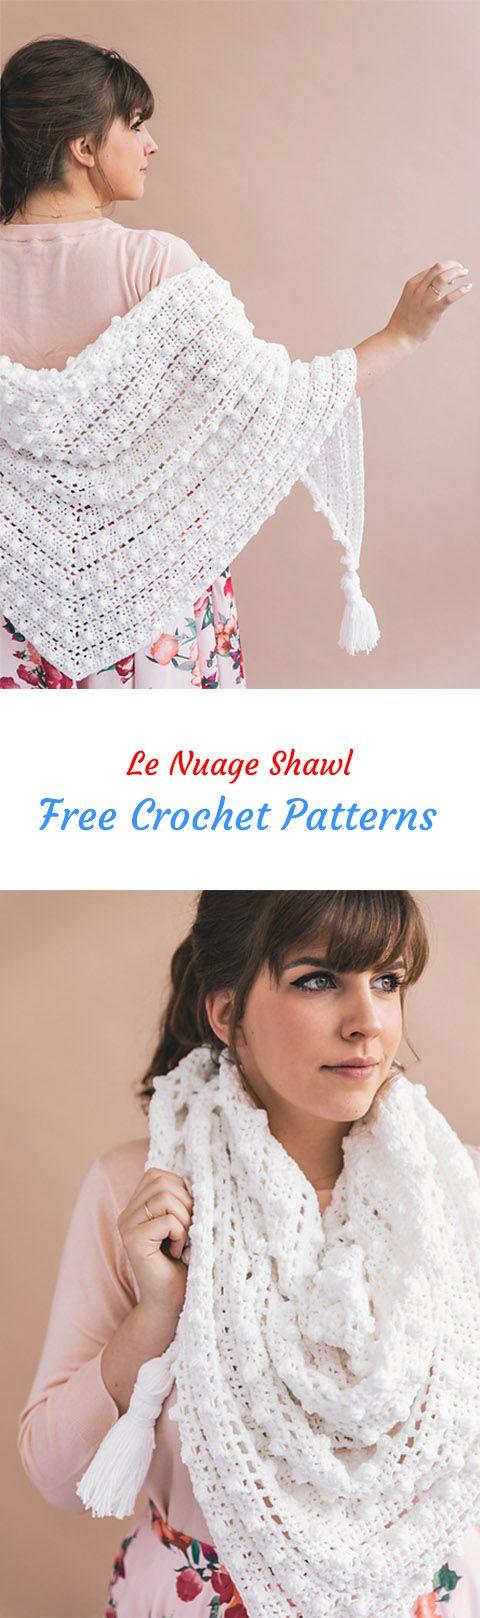 Le Nuage Shawl Free Crochet Pattern